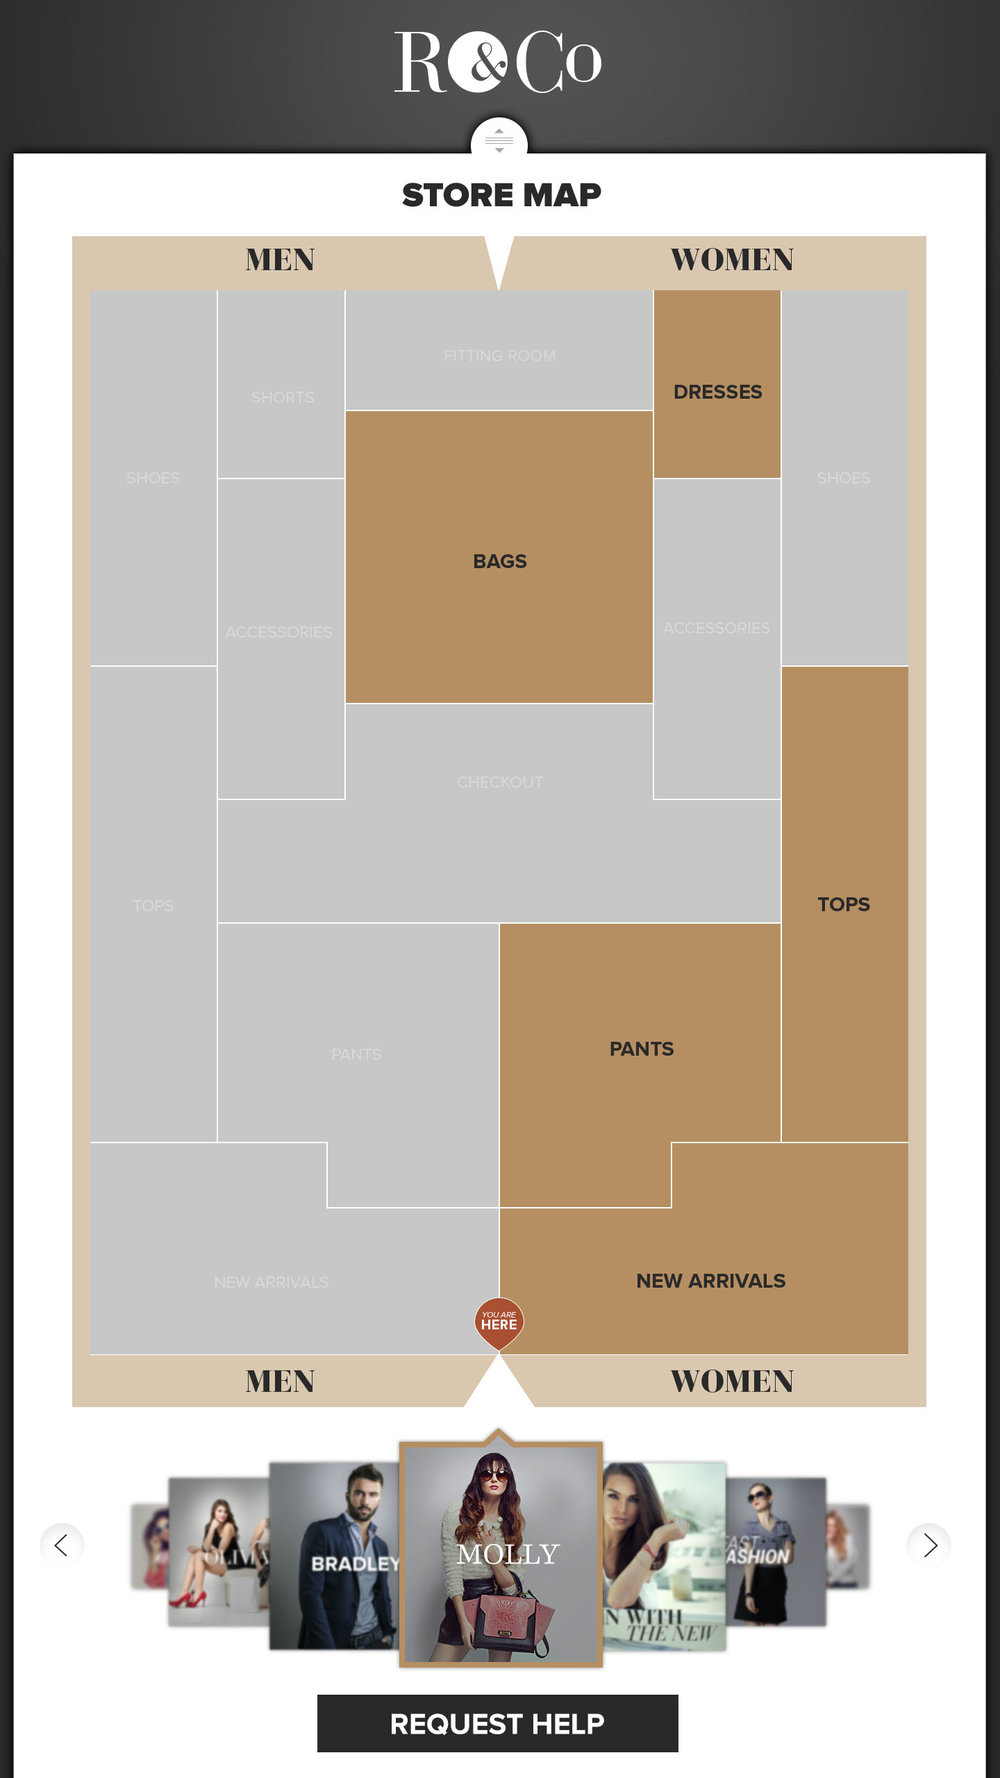 R&Co_ELO_Map_0002_Molly.jpg